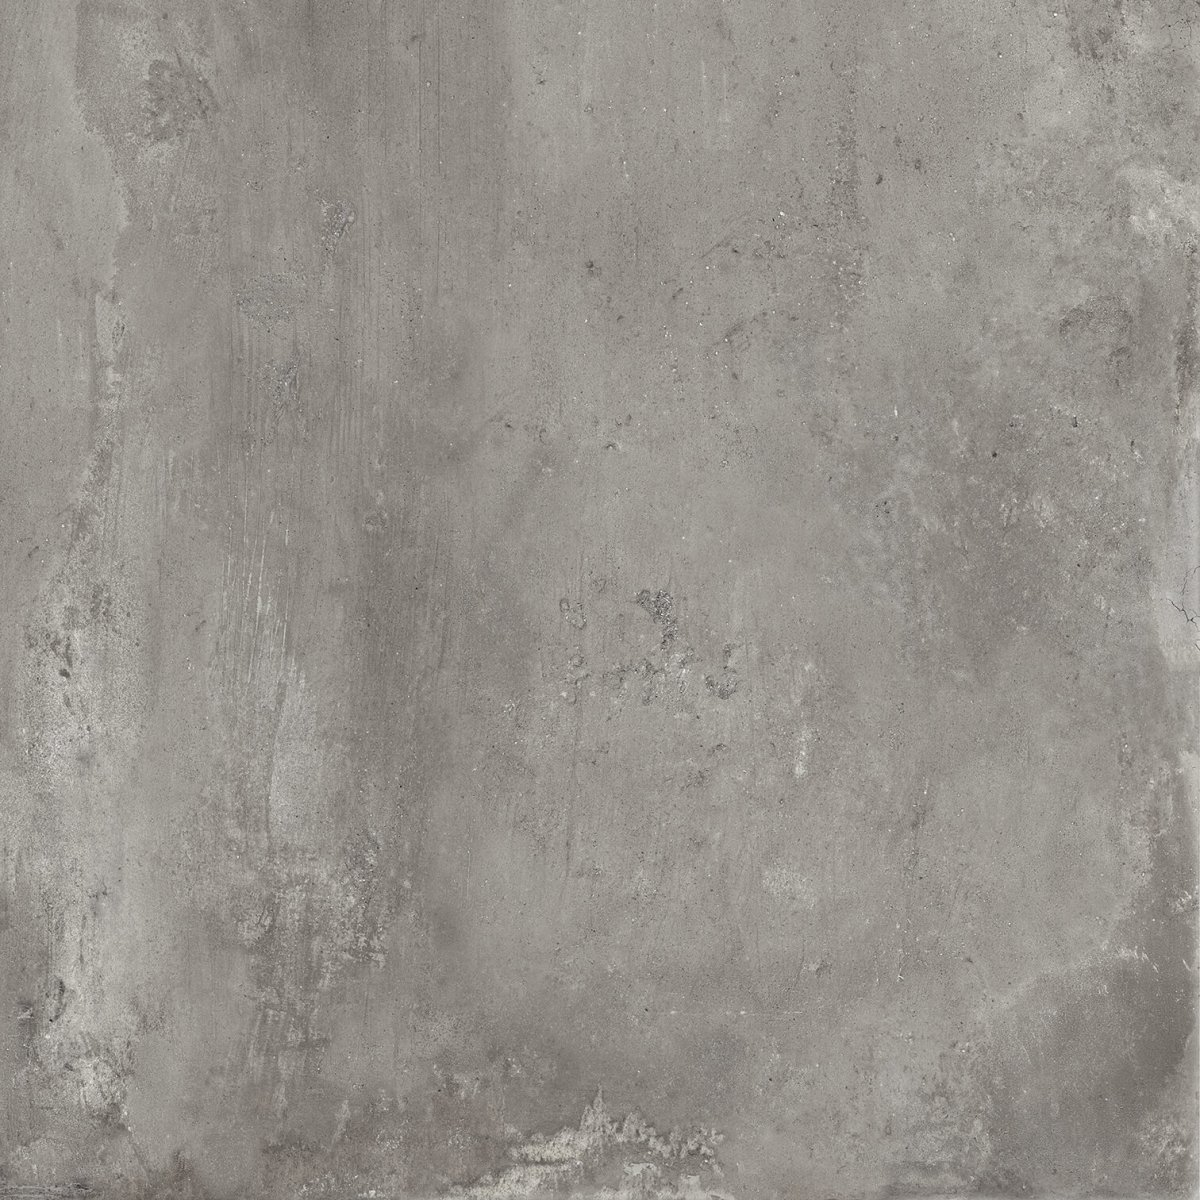 Florim Beton One Ash 600x600mm_Stiles_Product_Image2